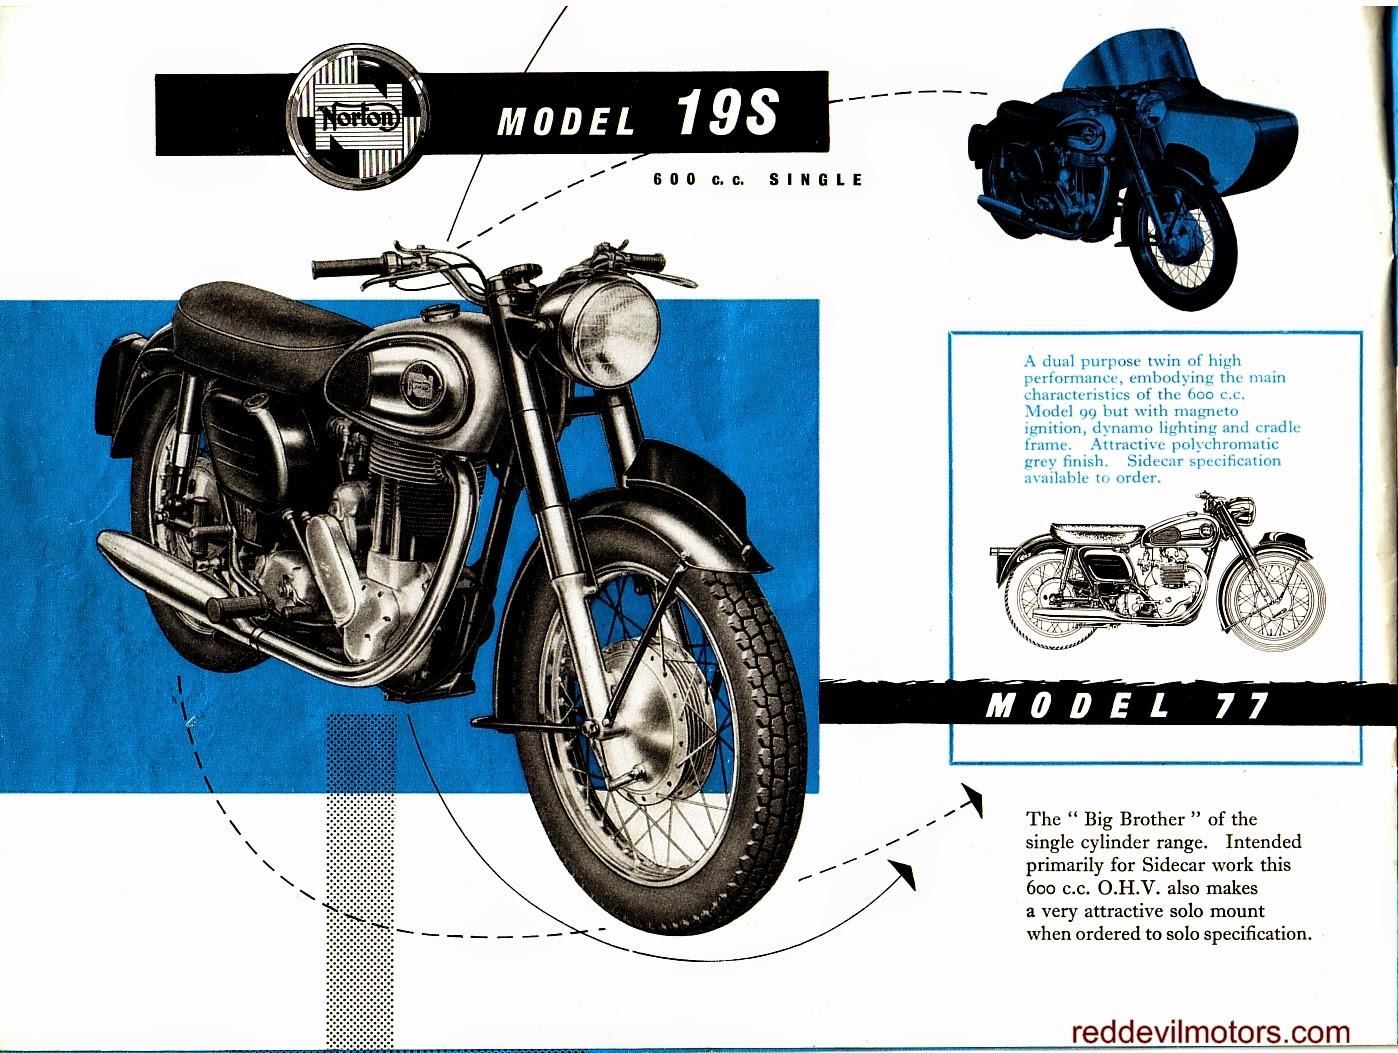 Red Devil Motors: 1958 Norton full range brochure